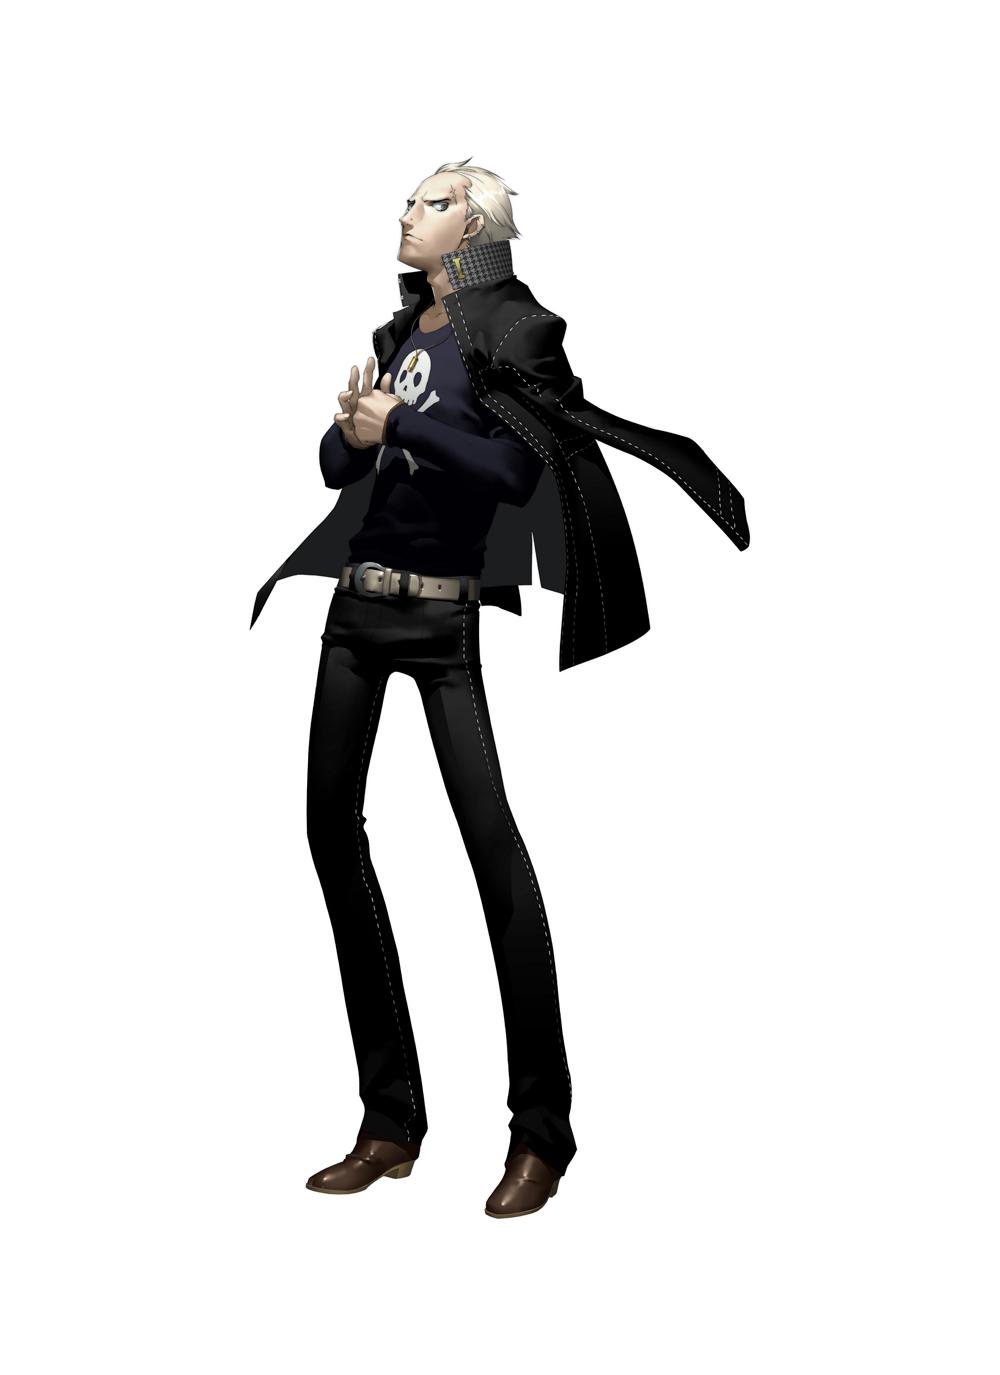 highres jacket jacket_on_shoulders jewelry male necklace official_art persona persona_4 scar shigenori_soejima short_hair silver_hair skull soejima_shigenori tatsumi_kanji